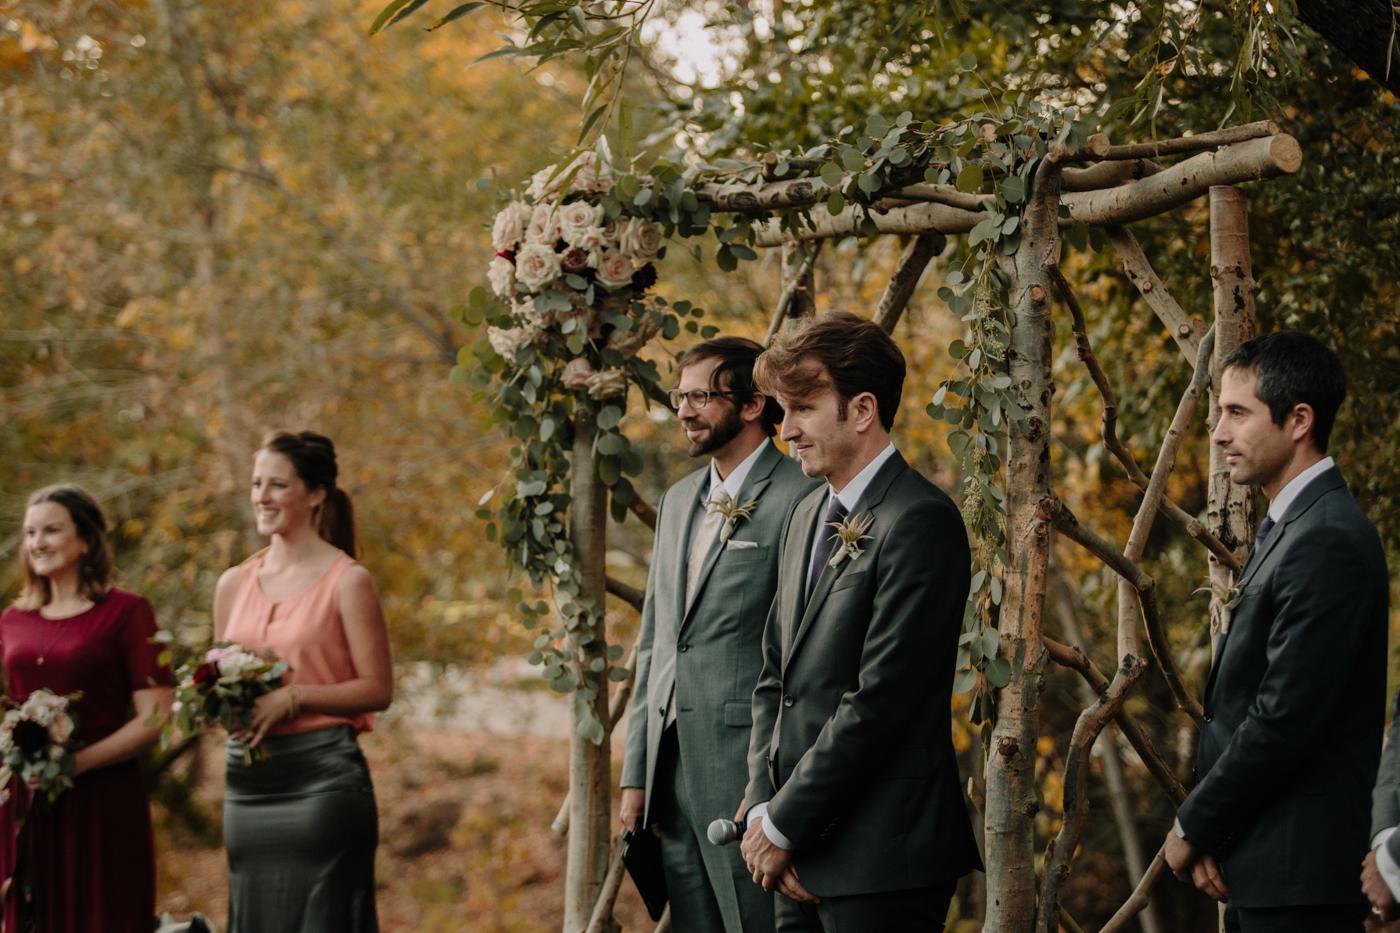 boulder-museum-modern-art-colorado-wedding-44.jpg